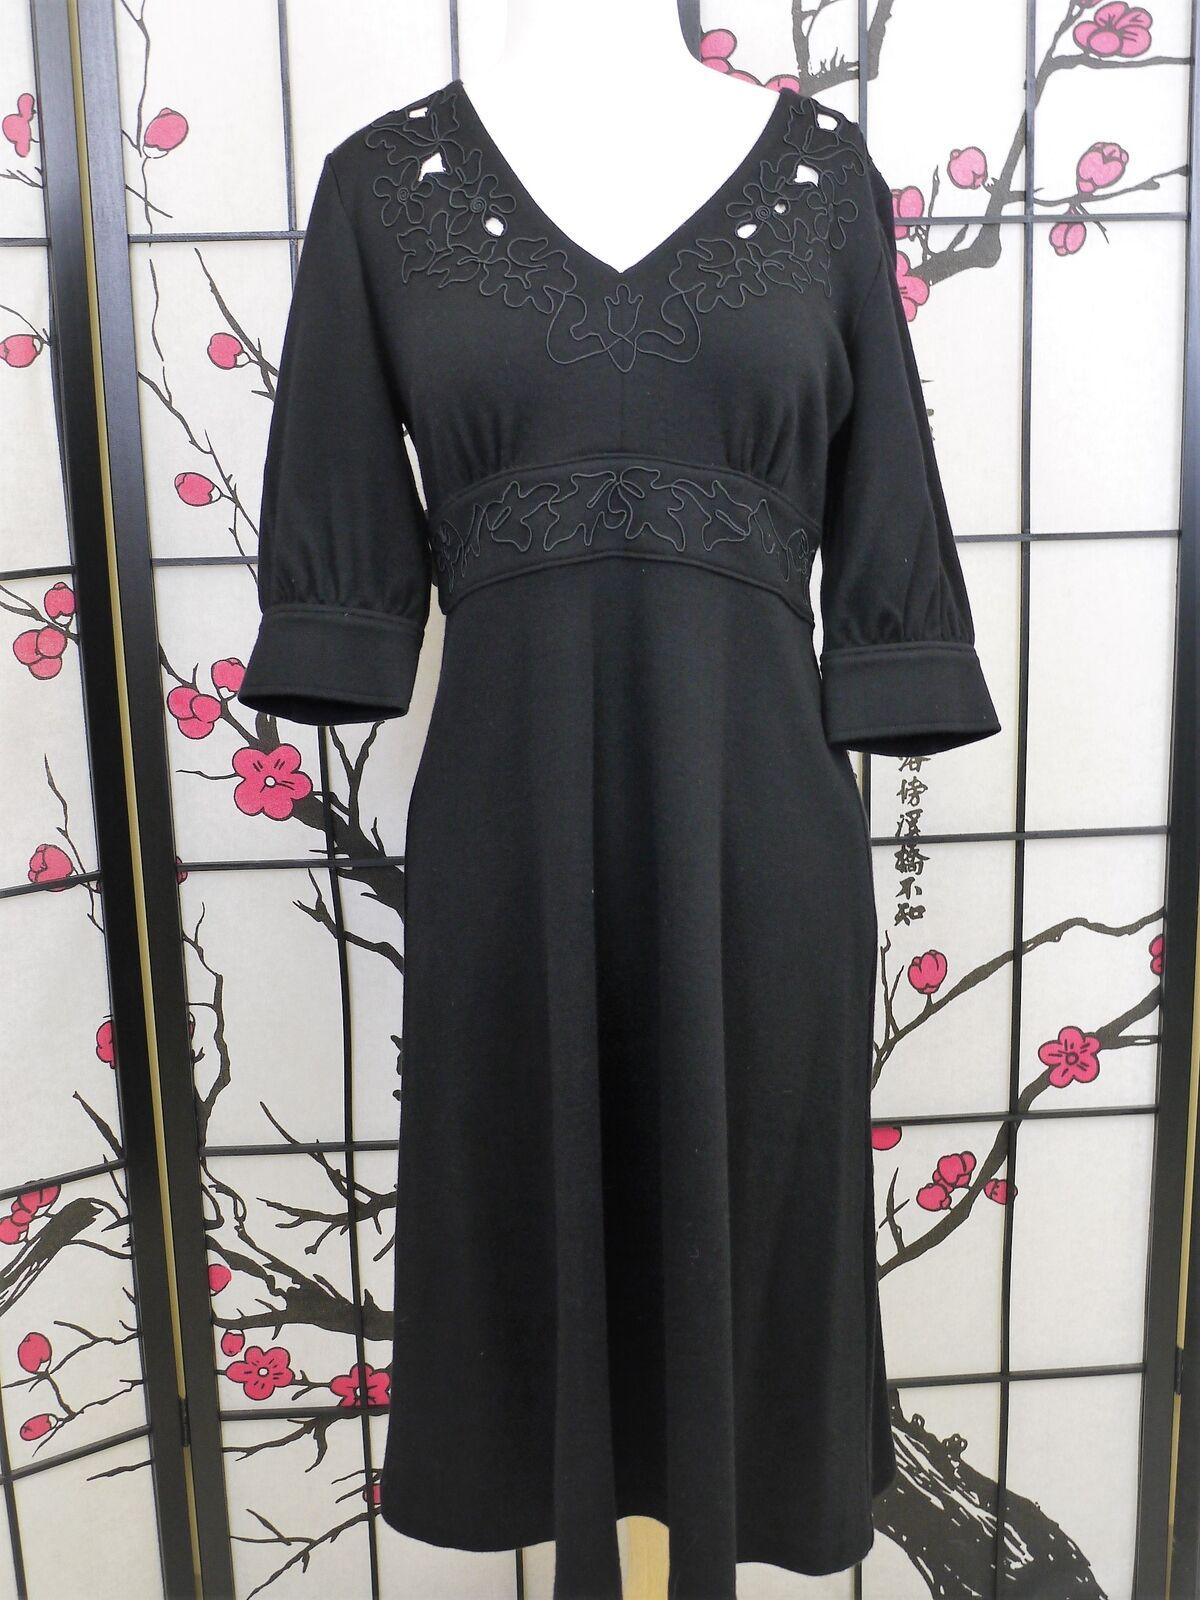 Cynthia Steffe Größe M schwarz Wool Dress Long Embroiderot Cut Outs